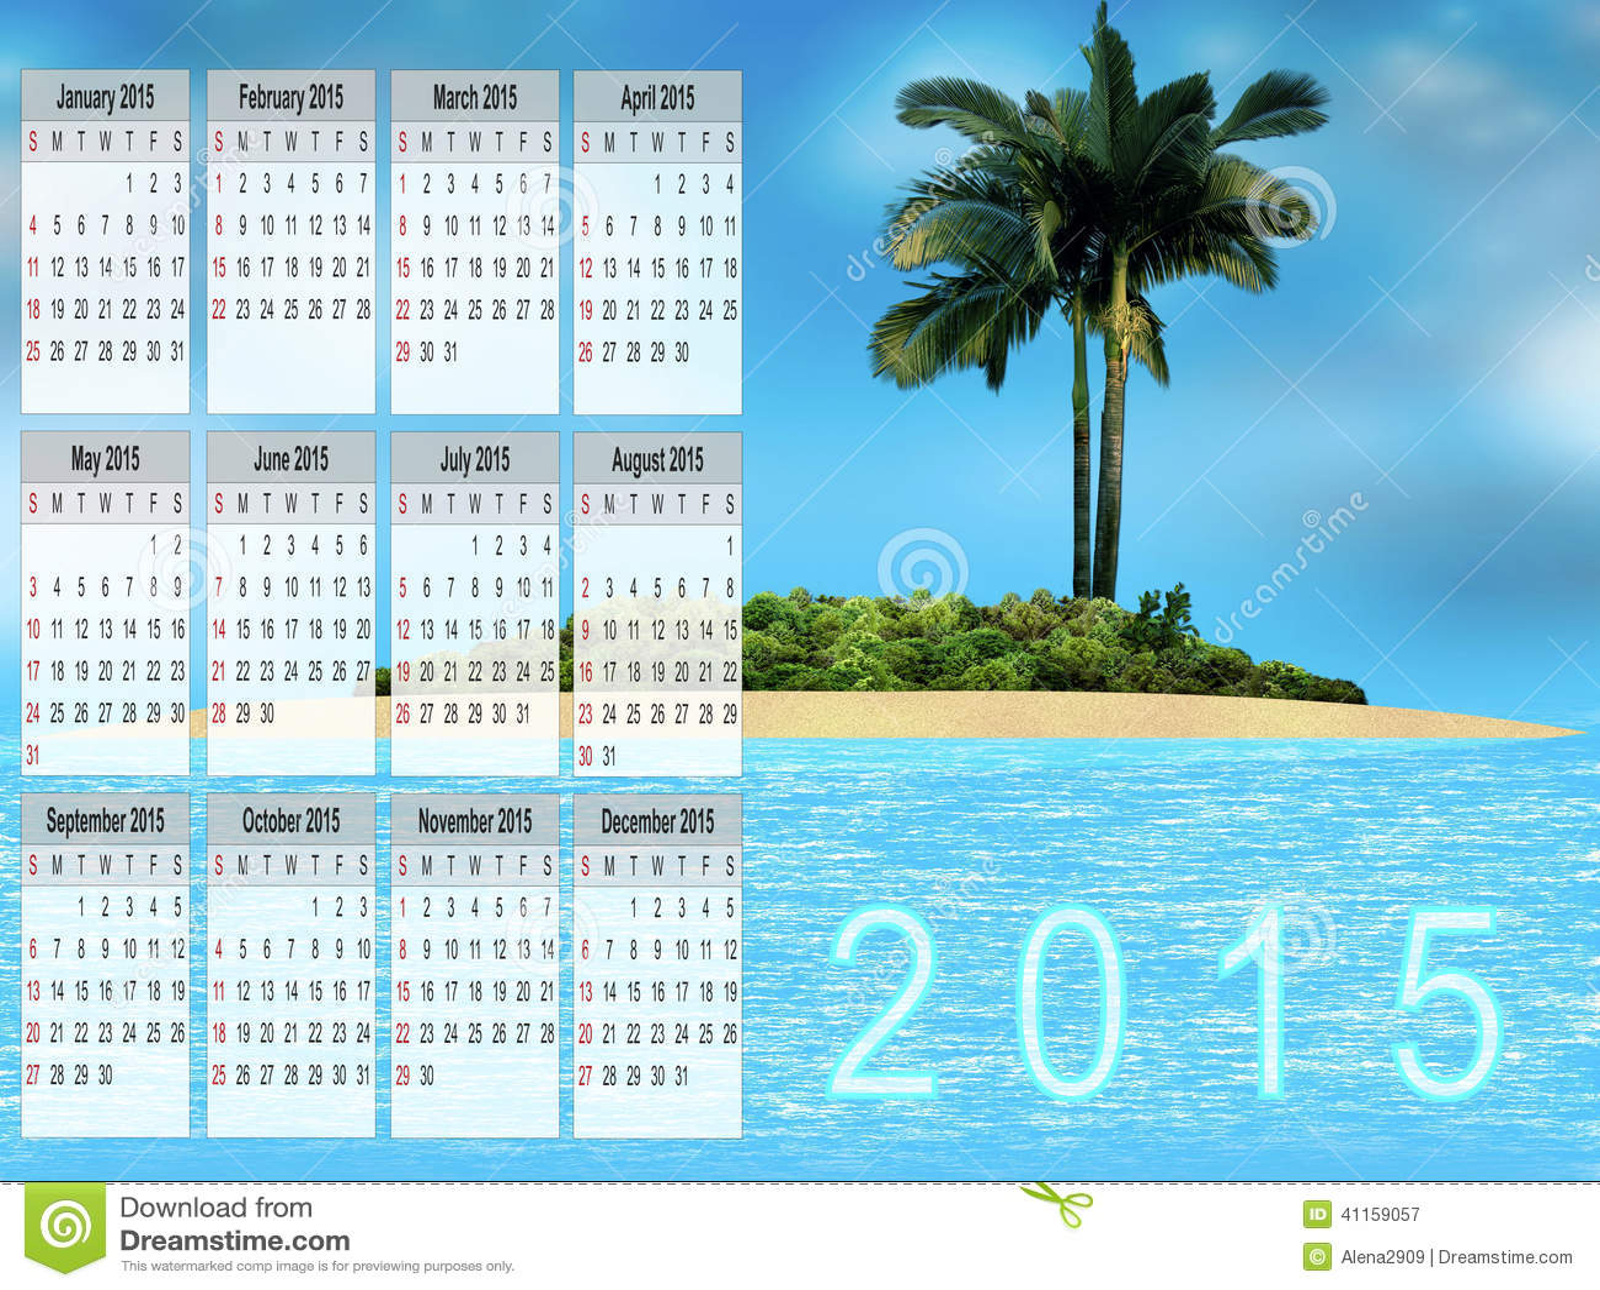 Calendrier pour 2015 illustration stock image 41159057 for Calendrier jardin fevrier 2015